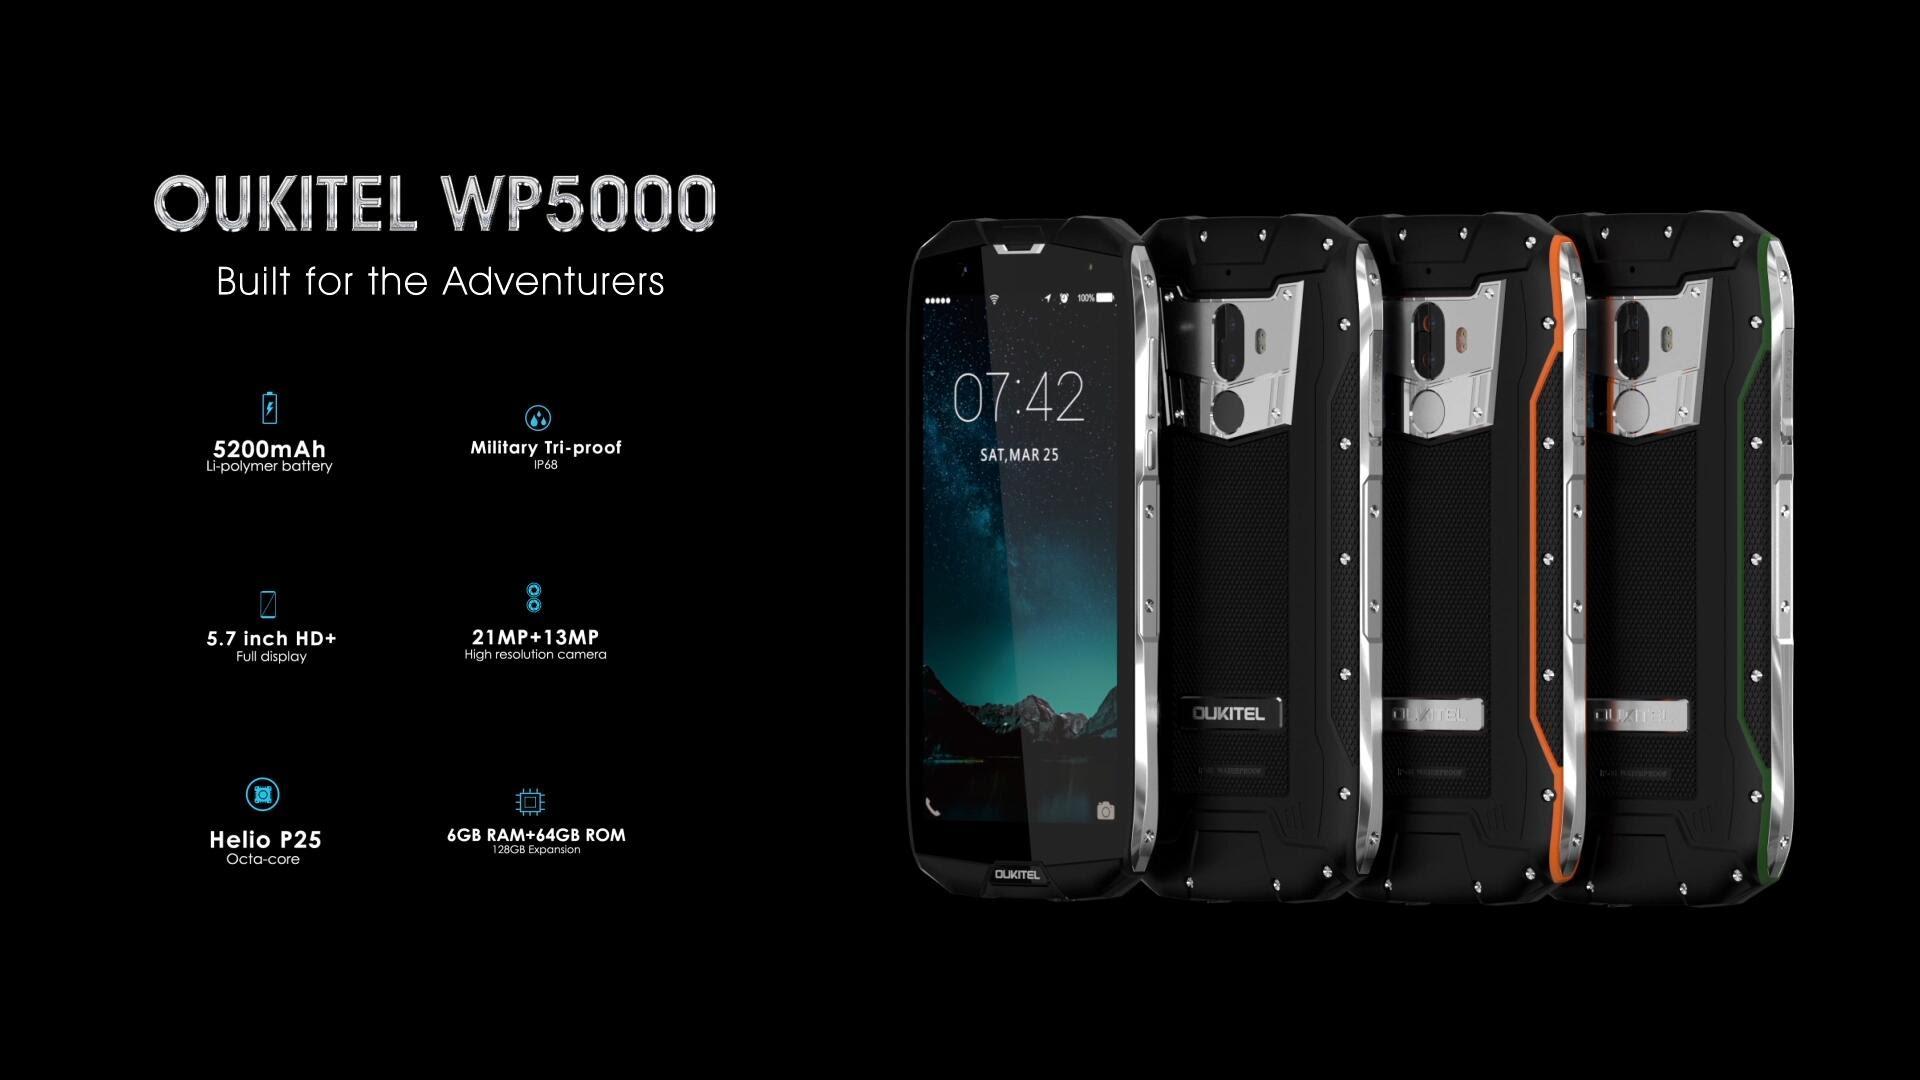 WP5000